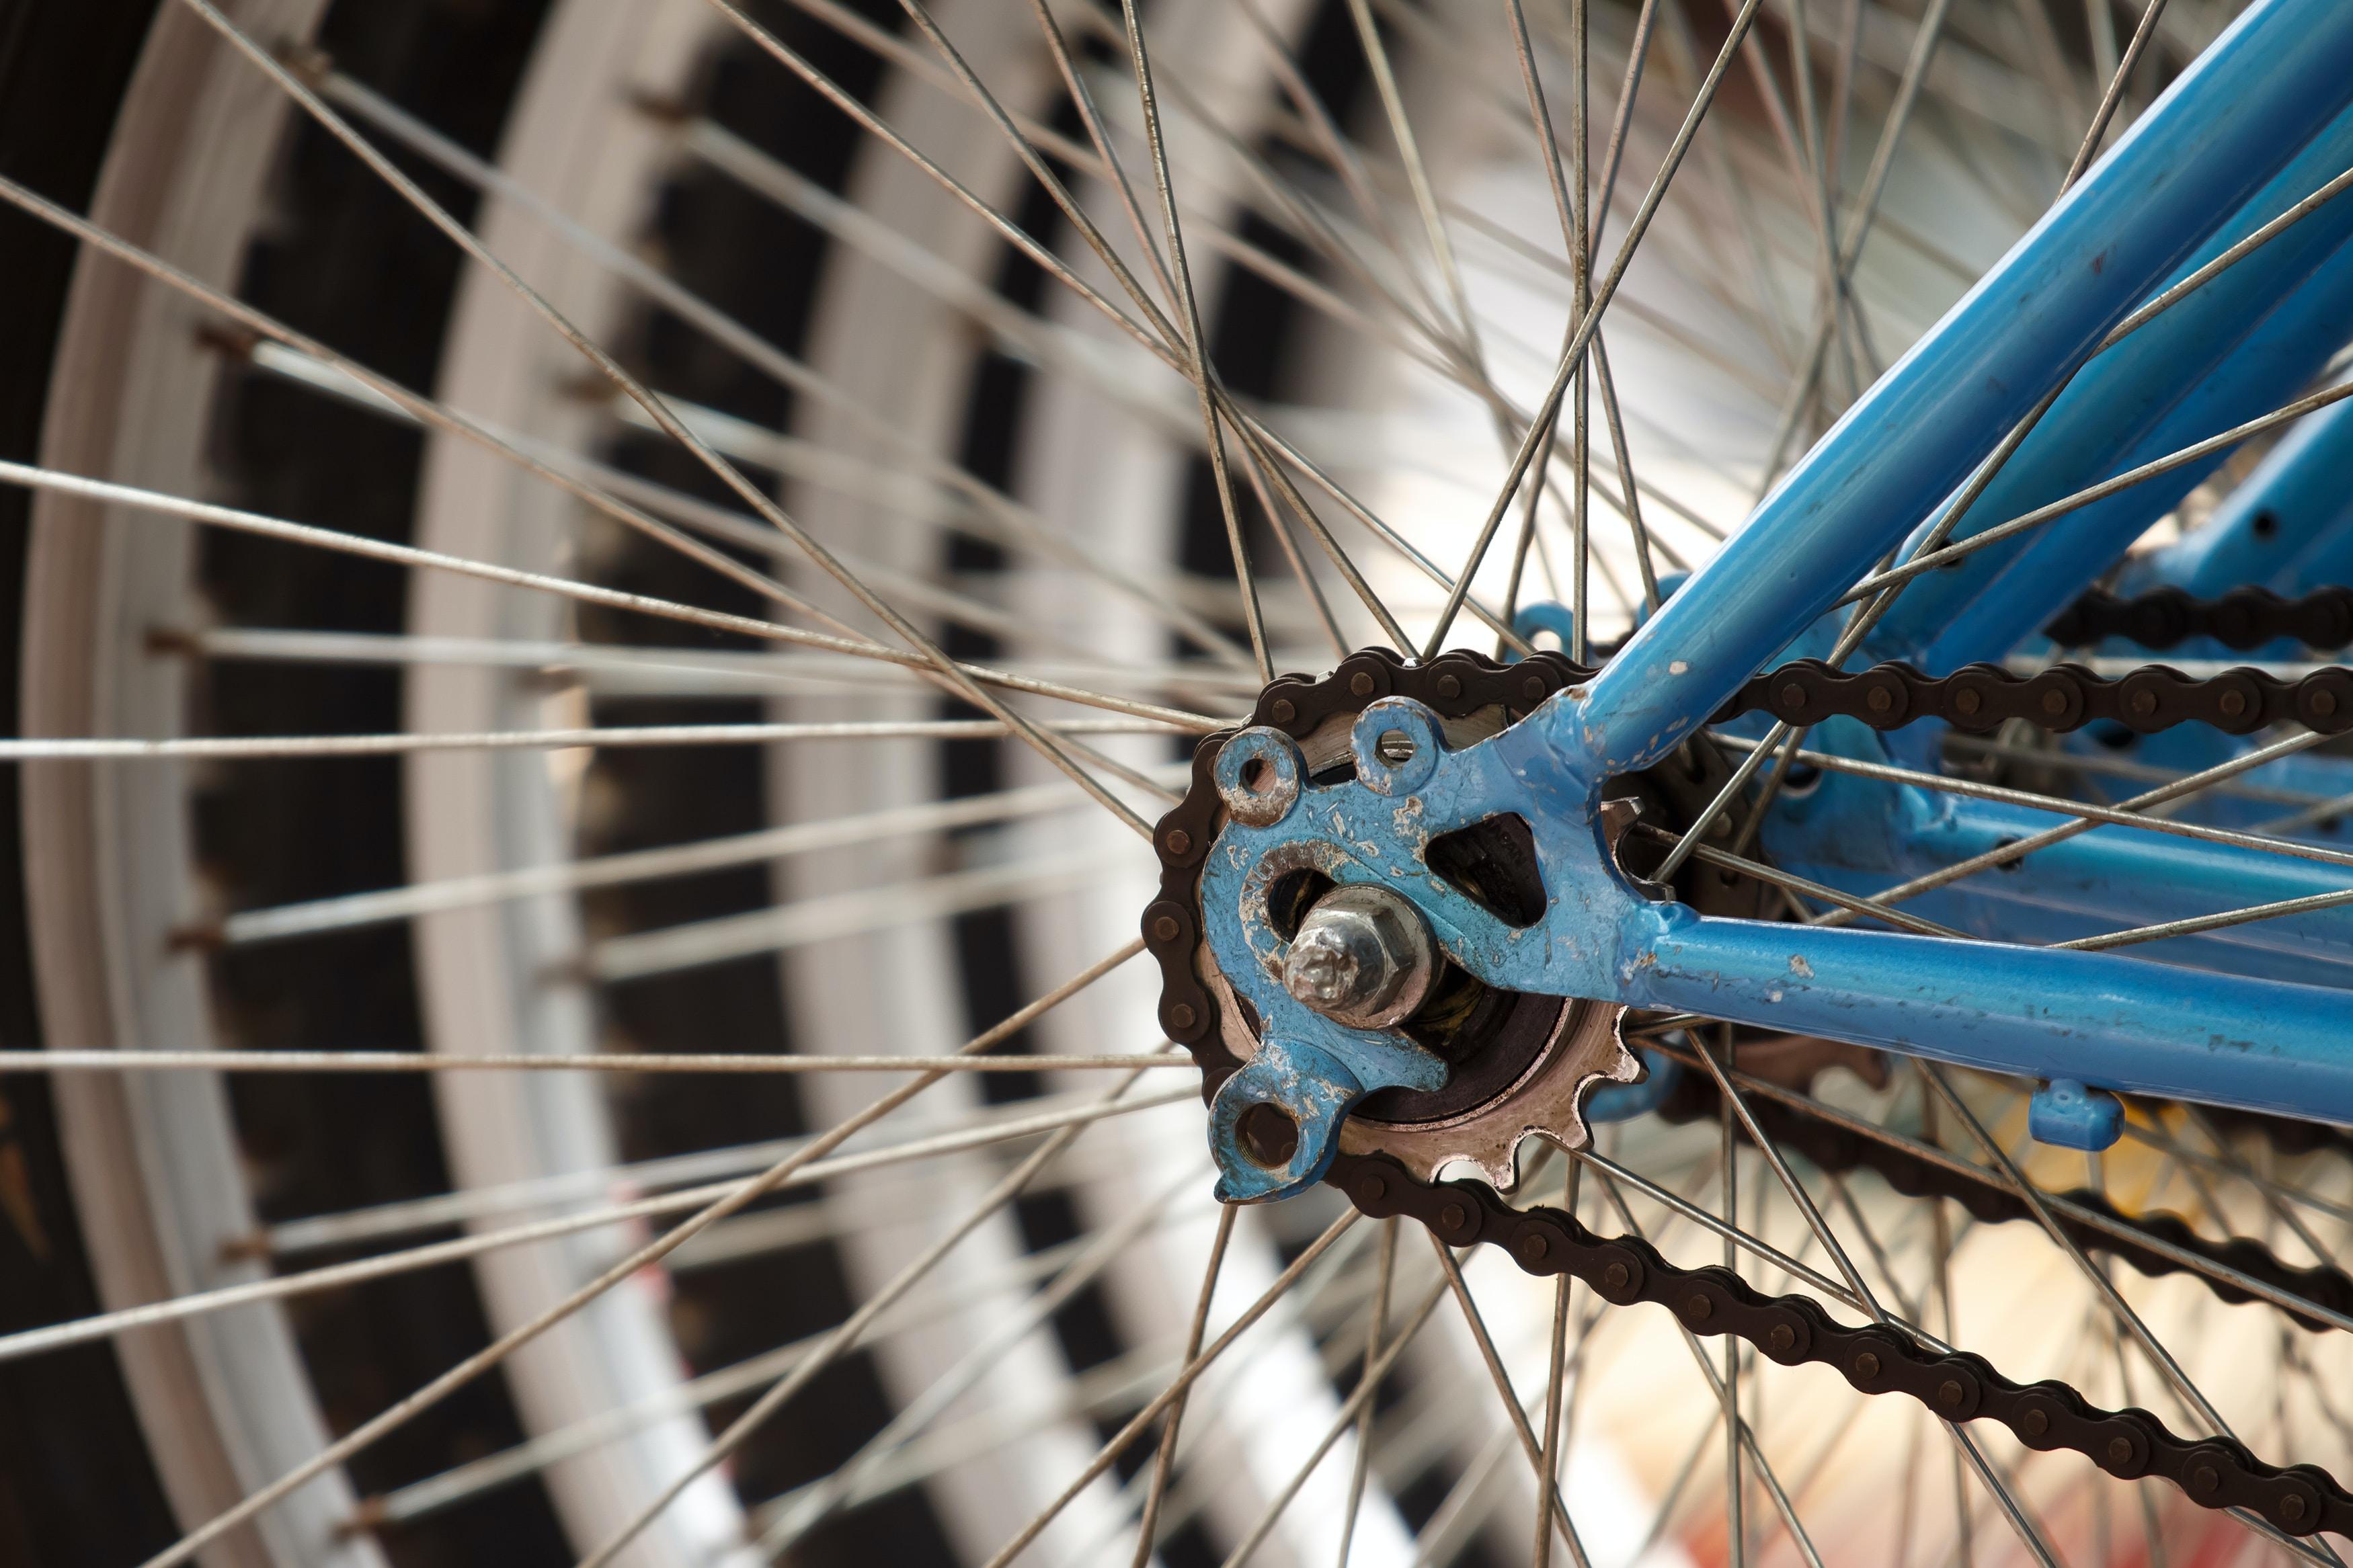 gray bike rim